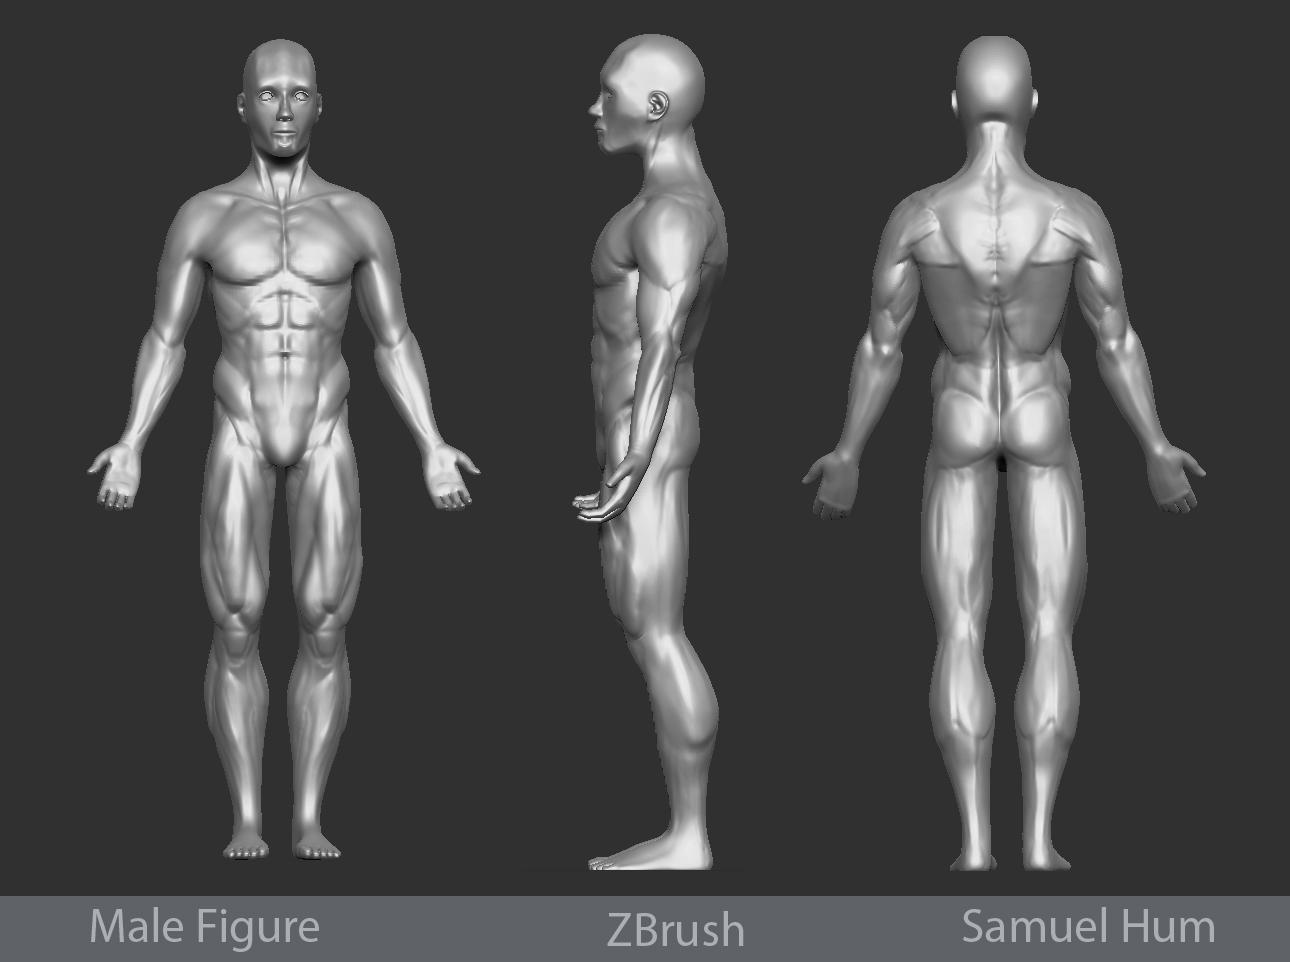 male figure zbrush sculpt pencilgym com